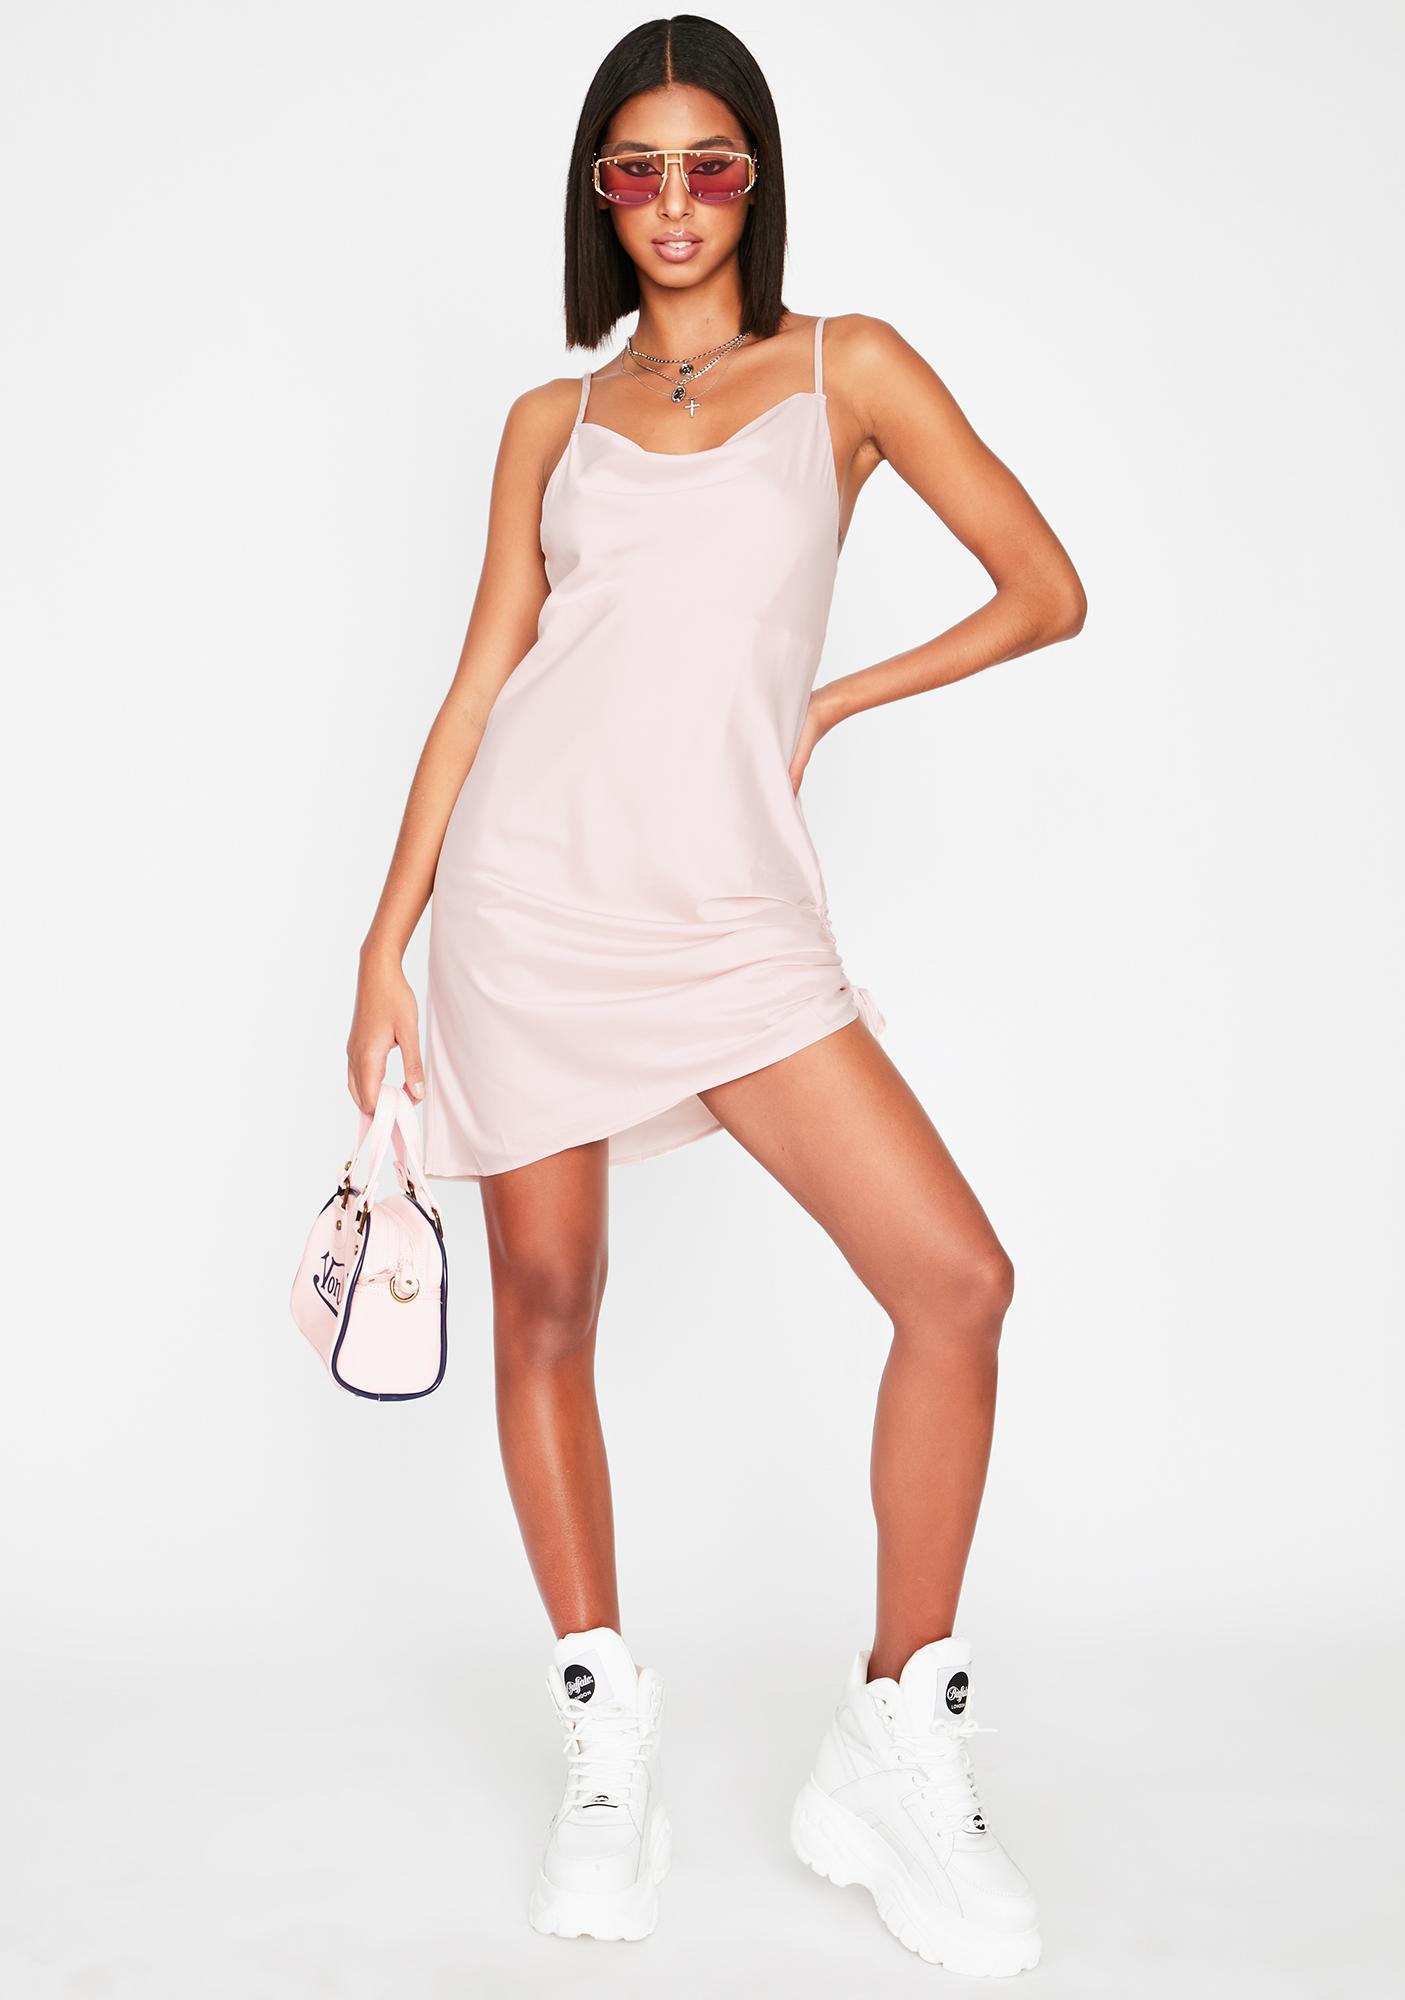 Pampered Princess Slip Dress